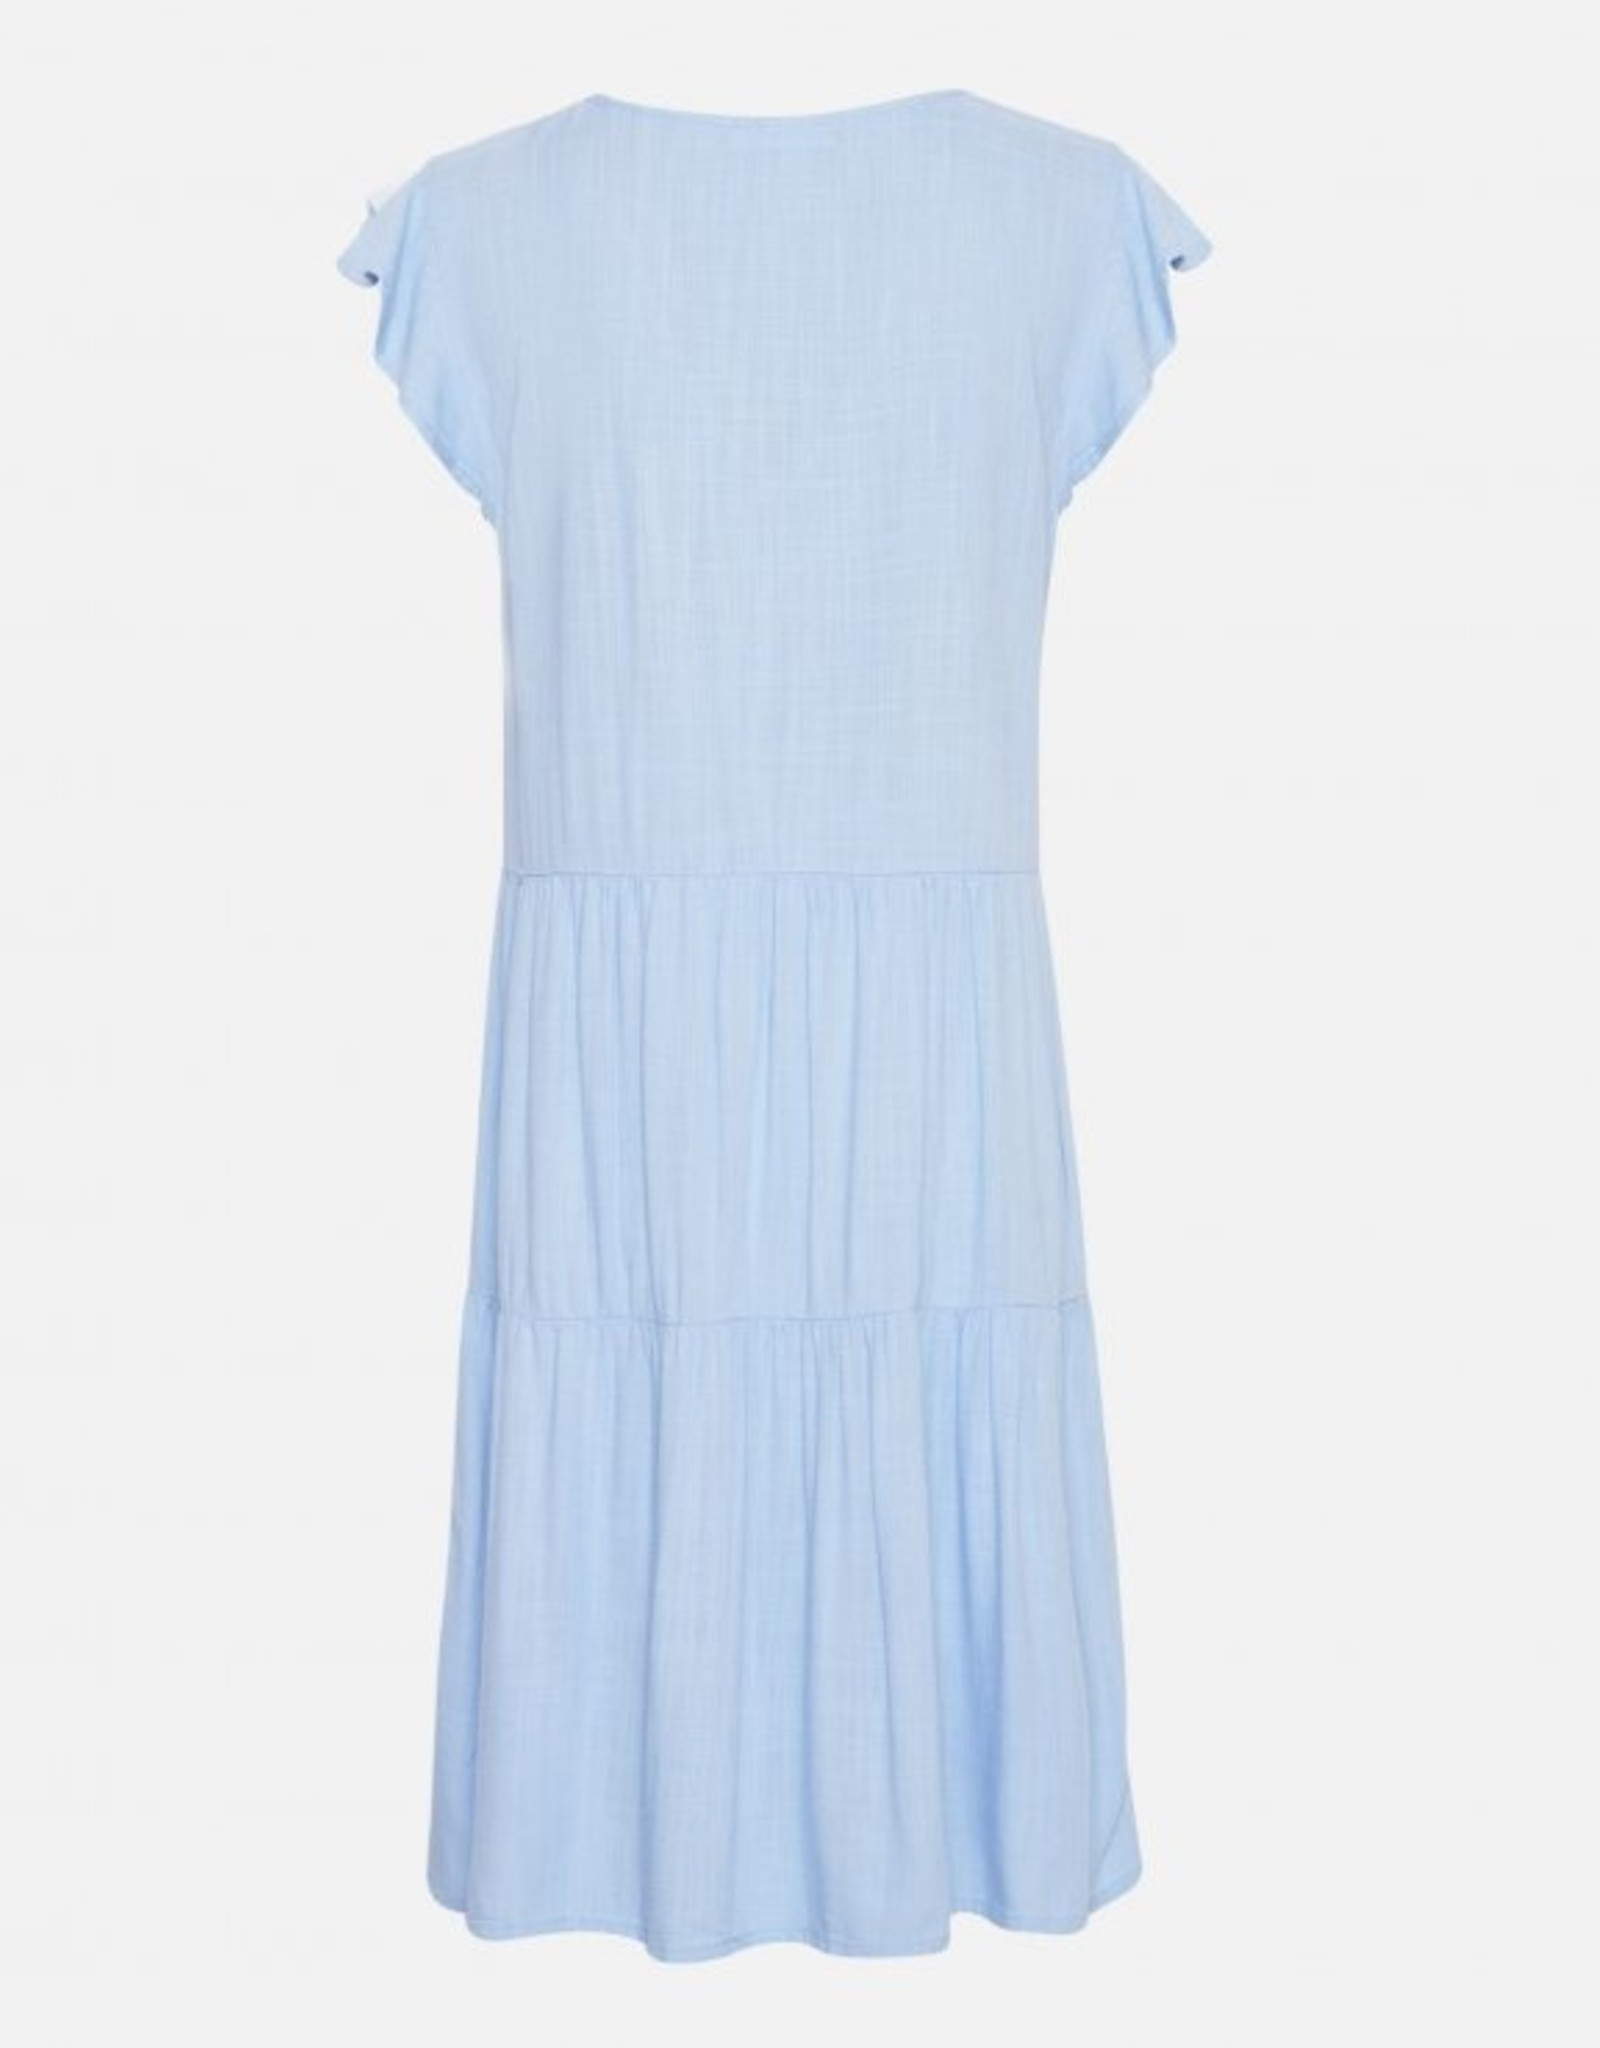 Moss Copenhagen Laida SL Dress Powder Blue